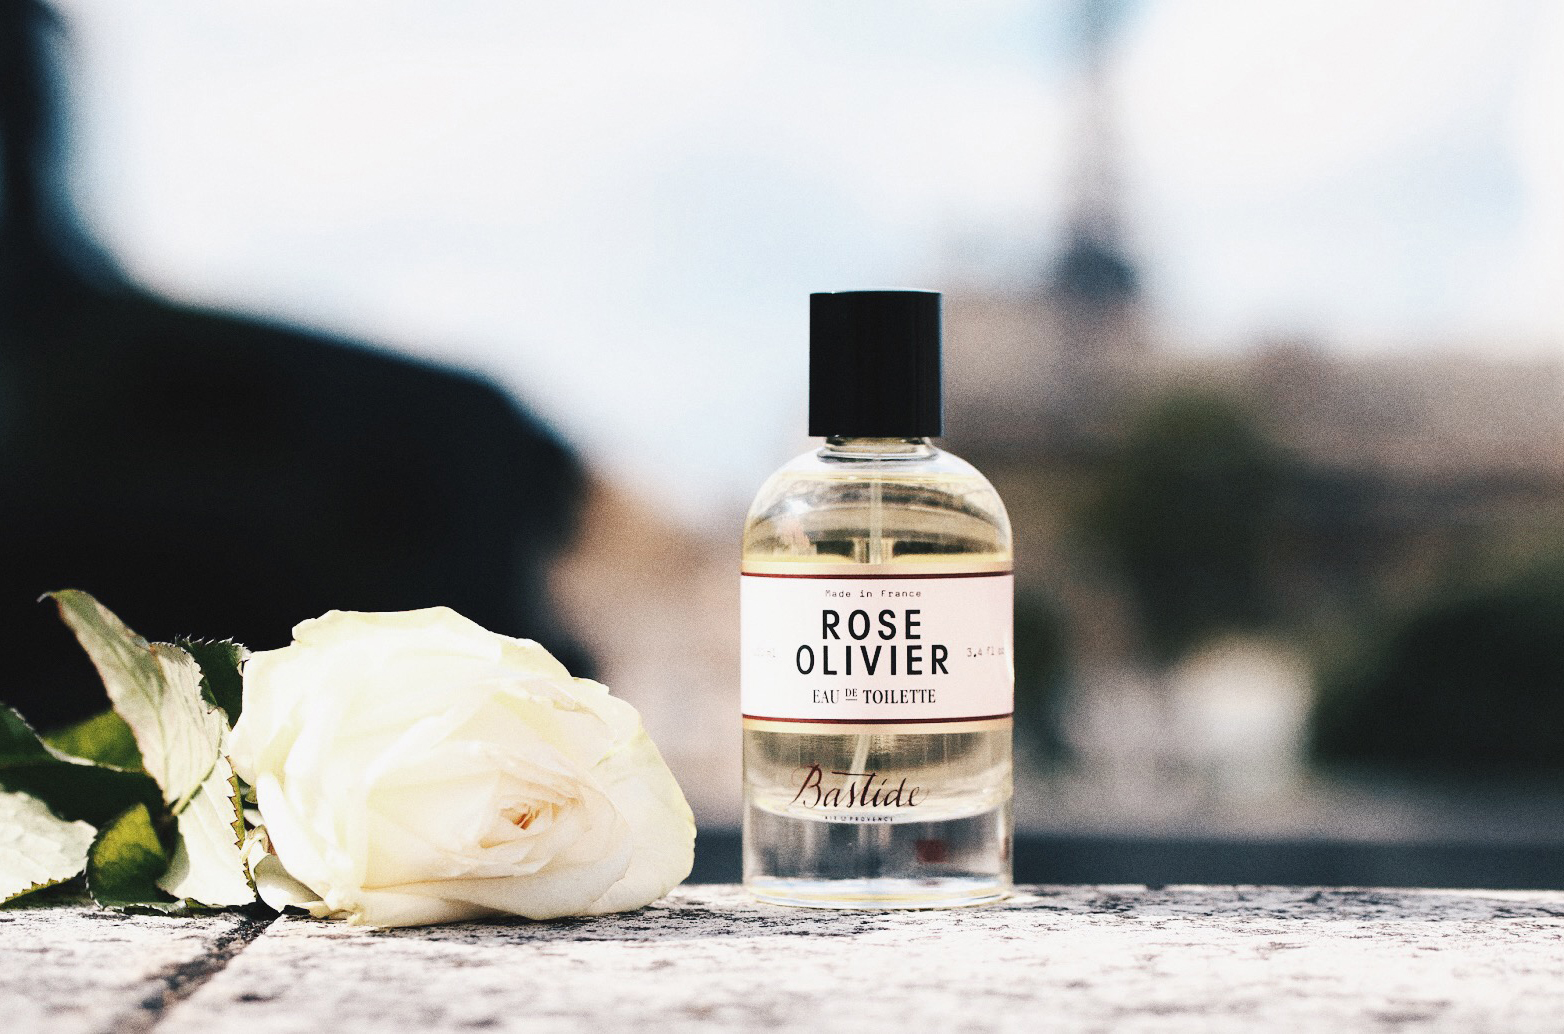 bastide rose olivier parfum avis test